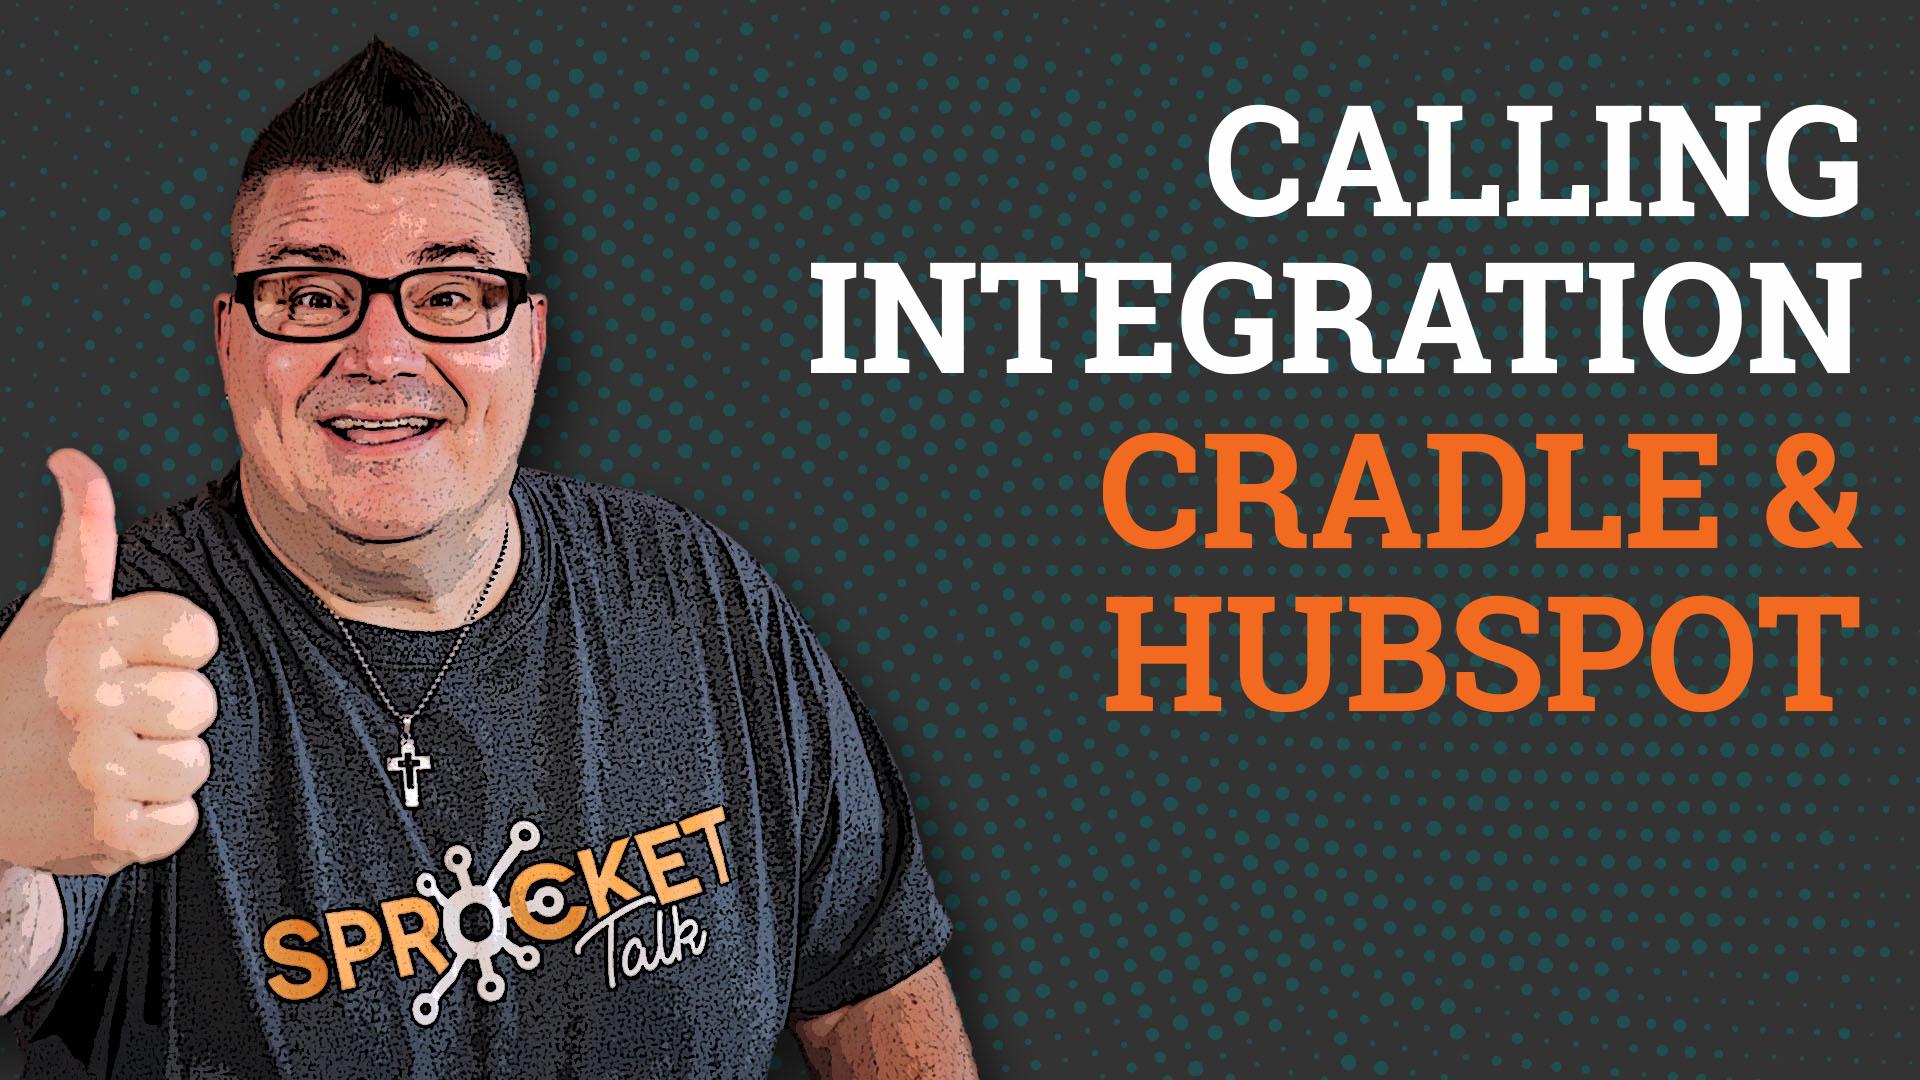 Cradle & HubSpot